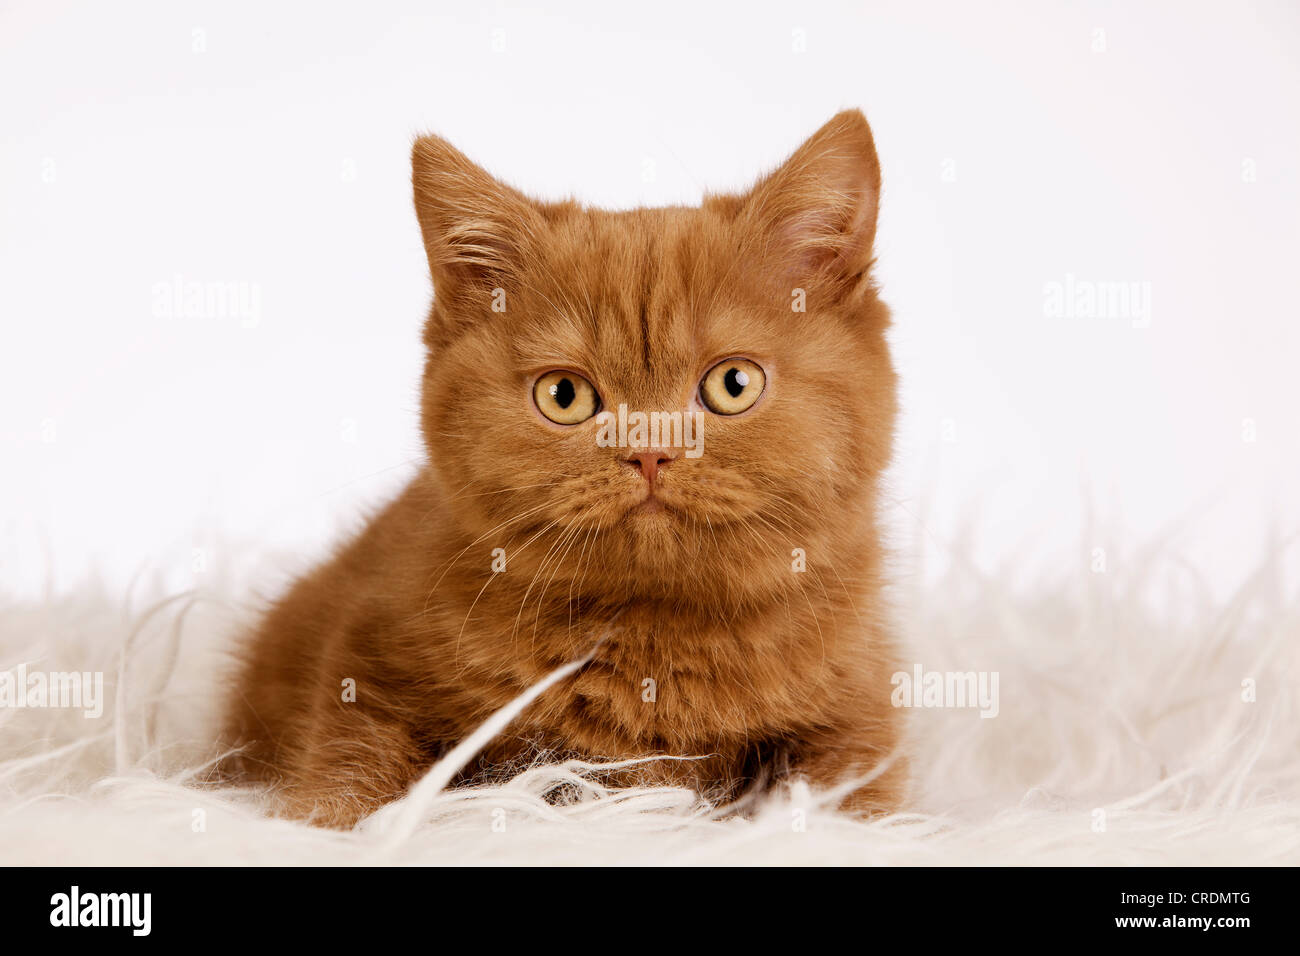 British Shorthair kitten sitting on a shag - Stock Image